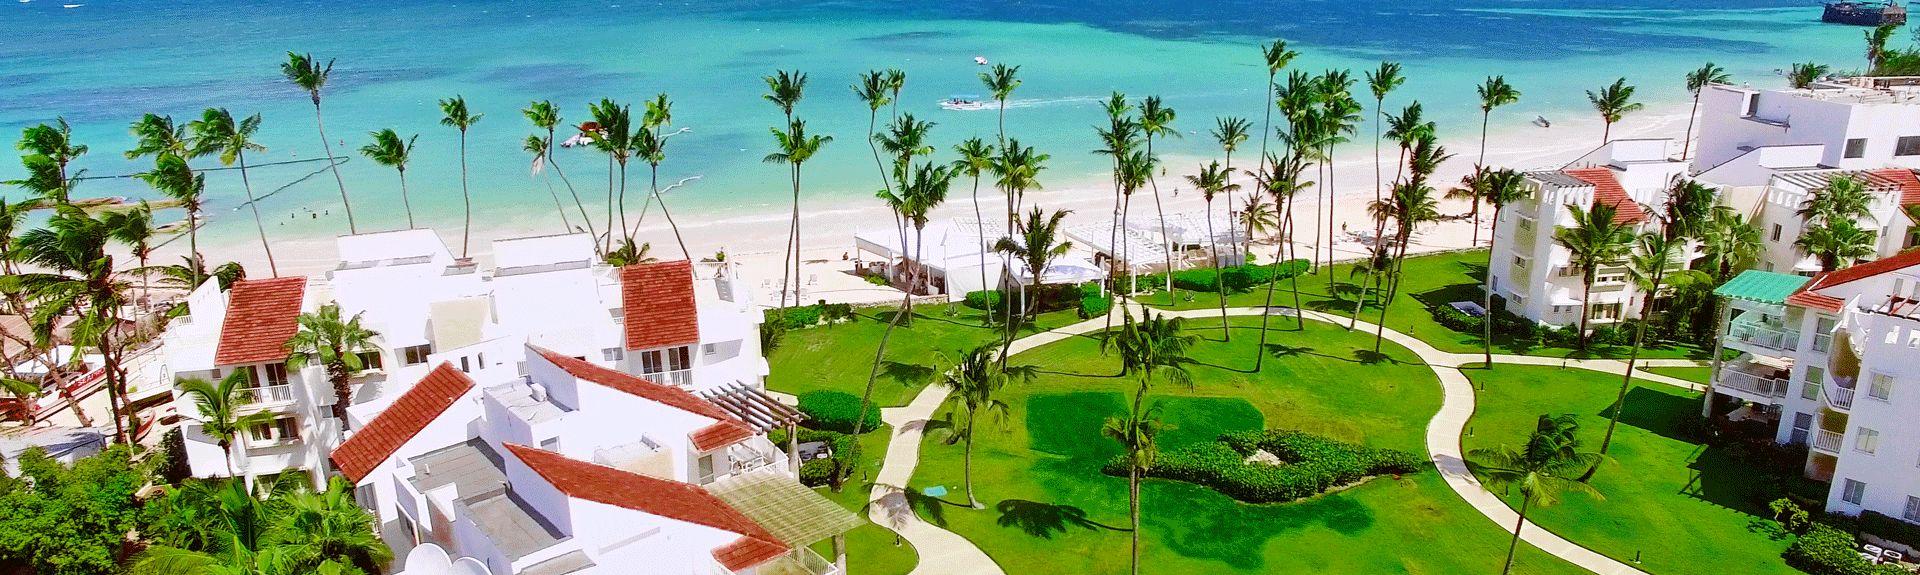 Playa Turquesa (Punta Cana, La Altagracia Province, République dominicaine)